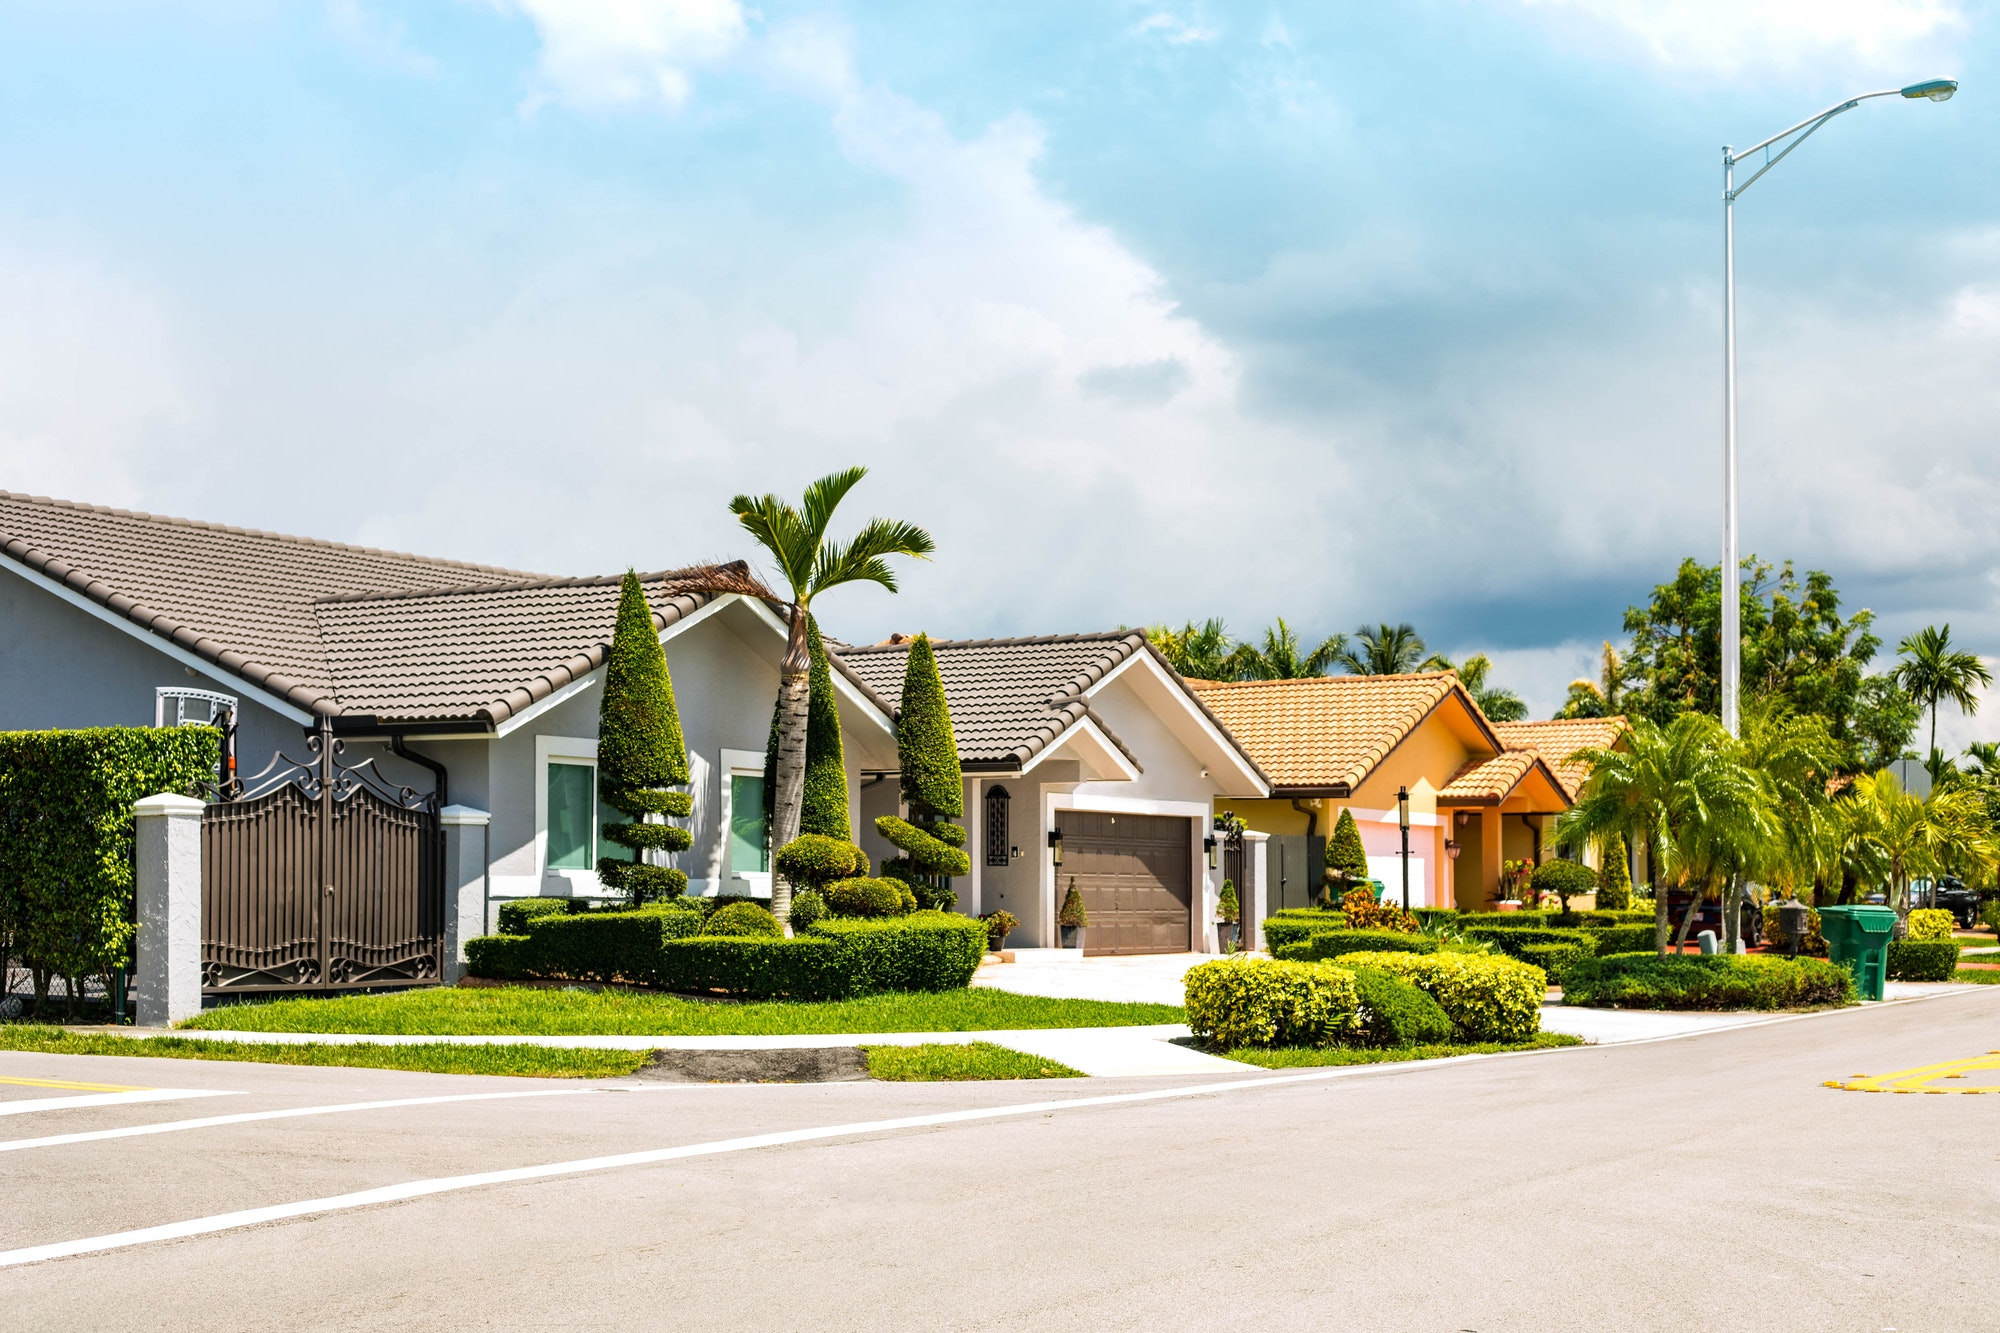 Set of Florida modern luxury houses in a residential neighborhood area.